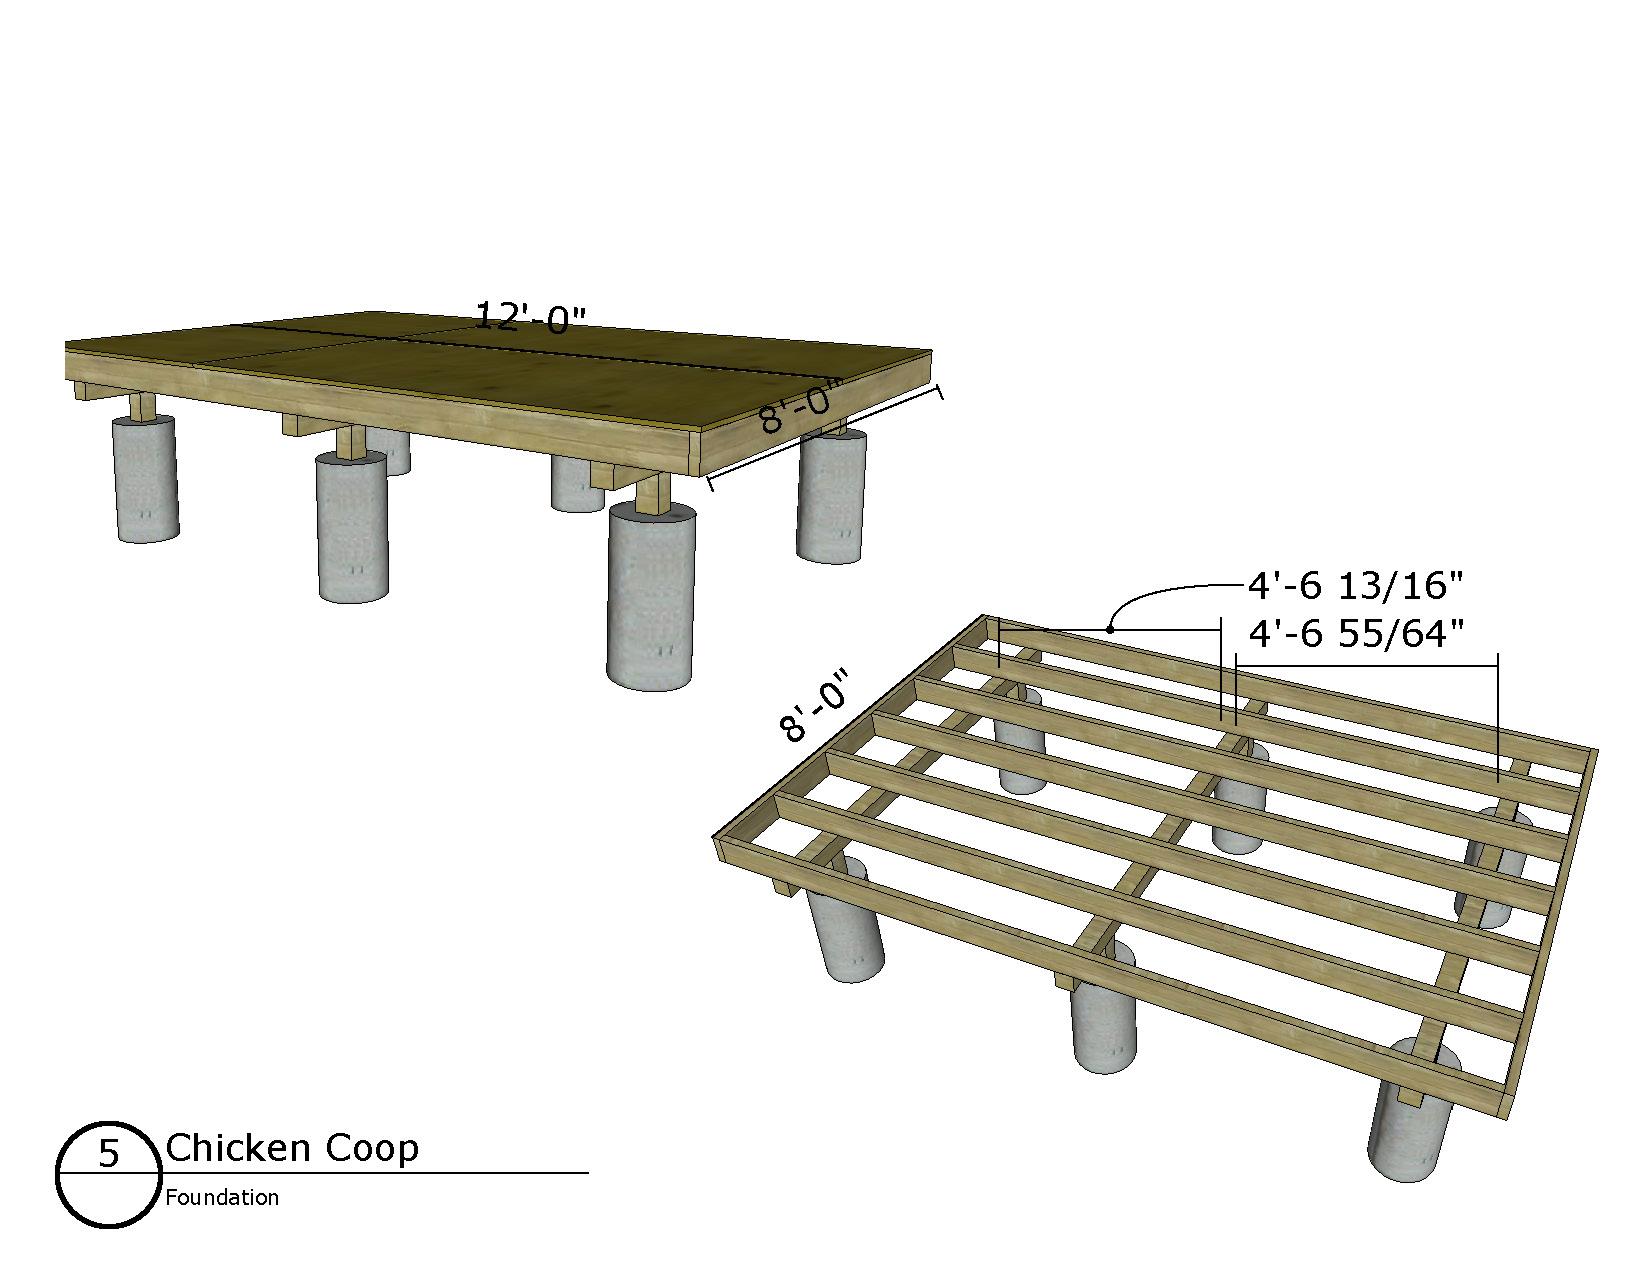 Chicken coop blueprints_Page_5.jpg